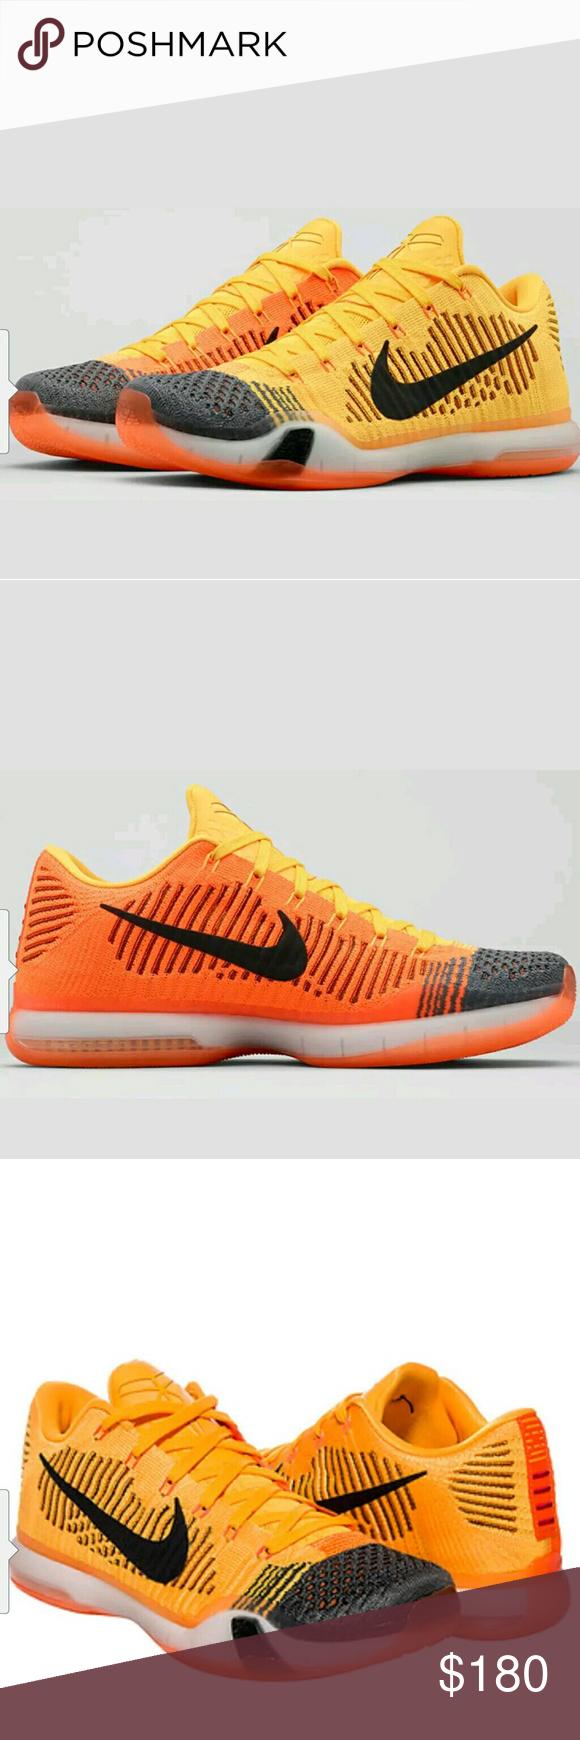 new concept 0eb20 b5e37 Orange · Nike Kobe X 10 Elite Low Chester Cheetah Rare Kobe X 10 Elite Low  Chester The